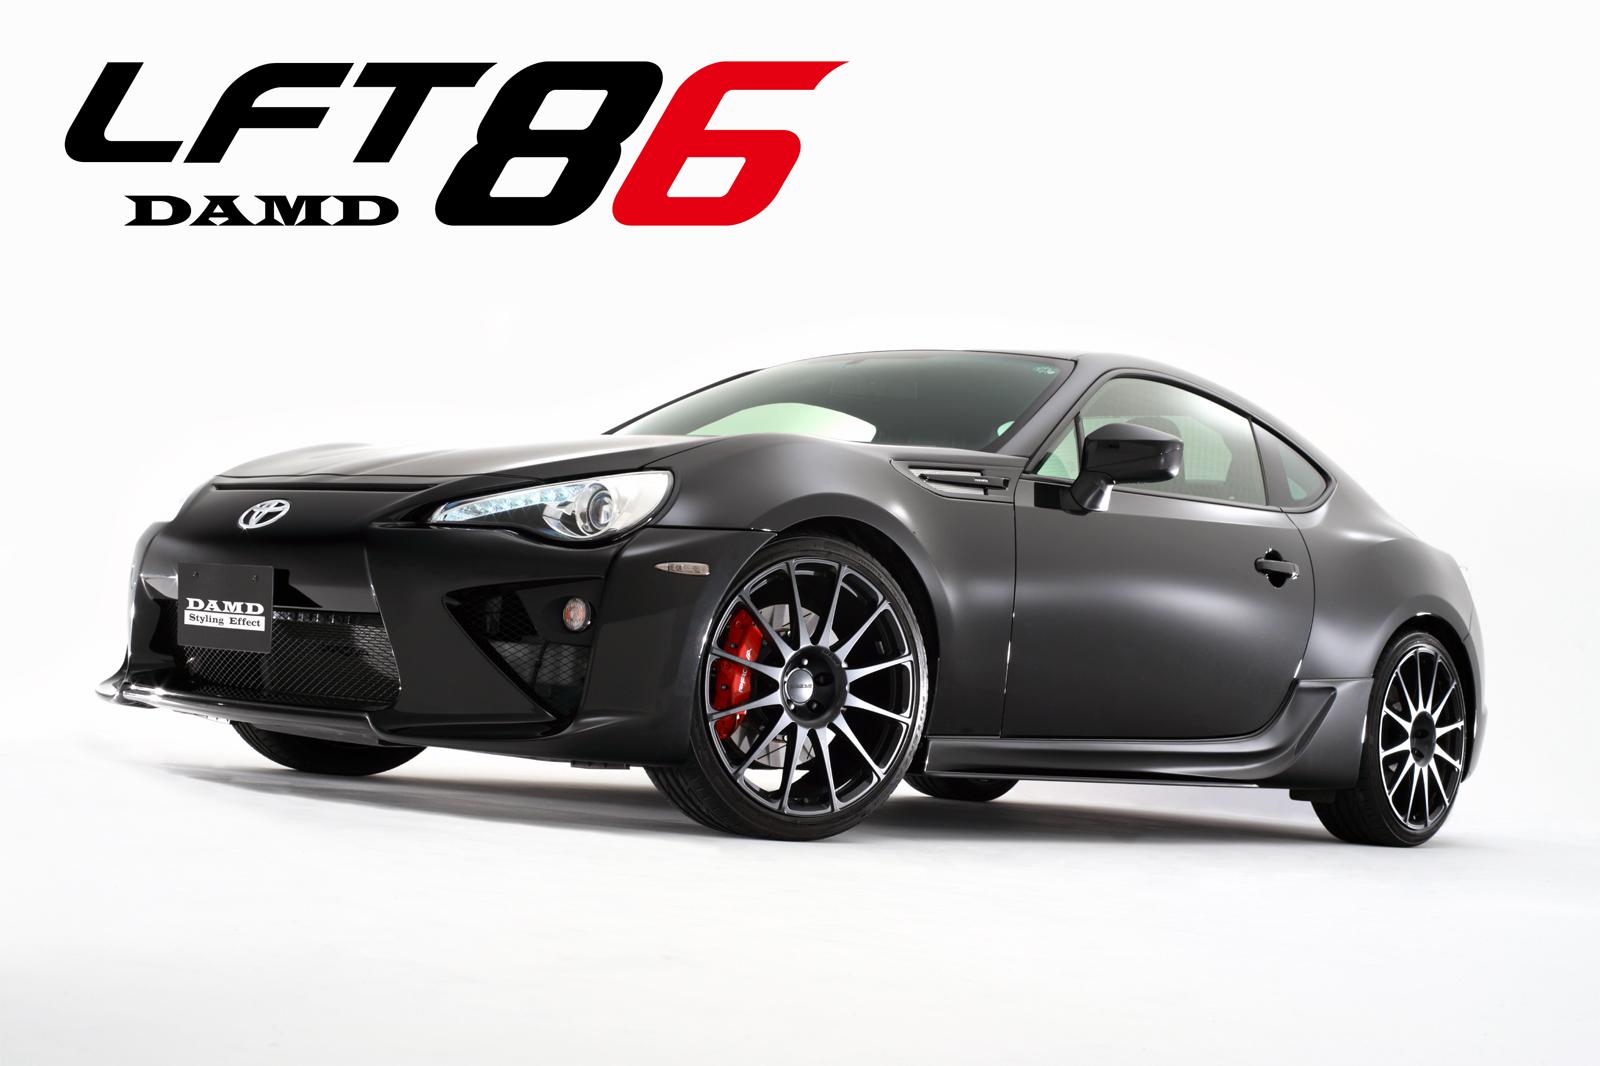 S0-Insolite-une-Toyota-GT86-qui-se-prend-pour-une-LFA-284029.jpg